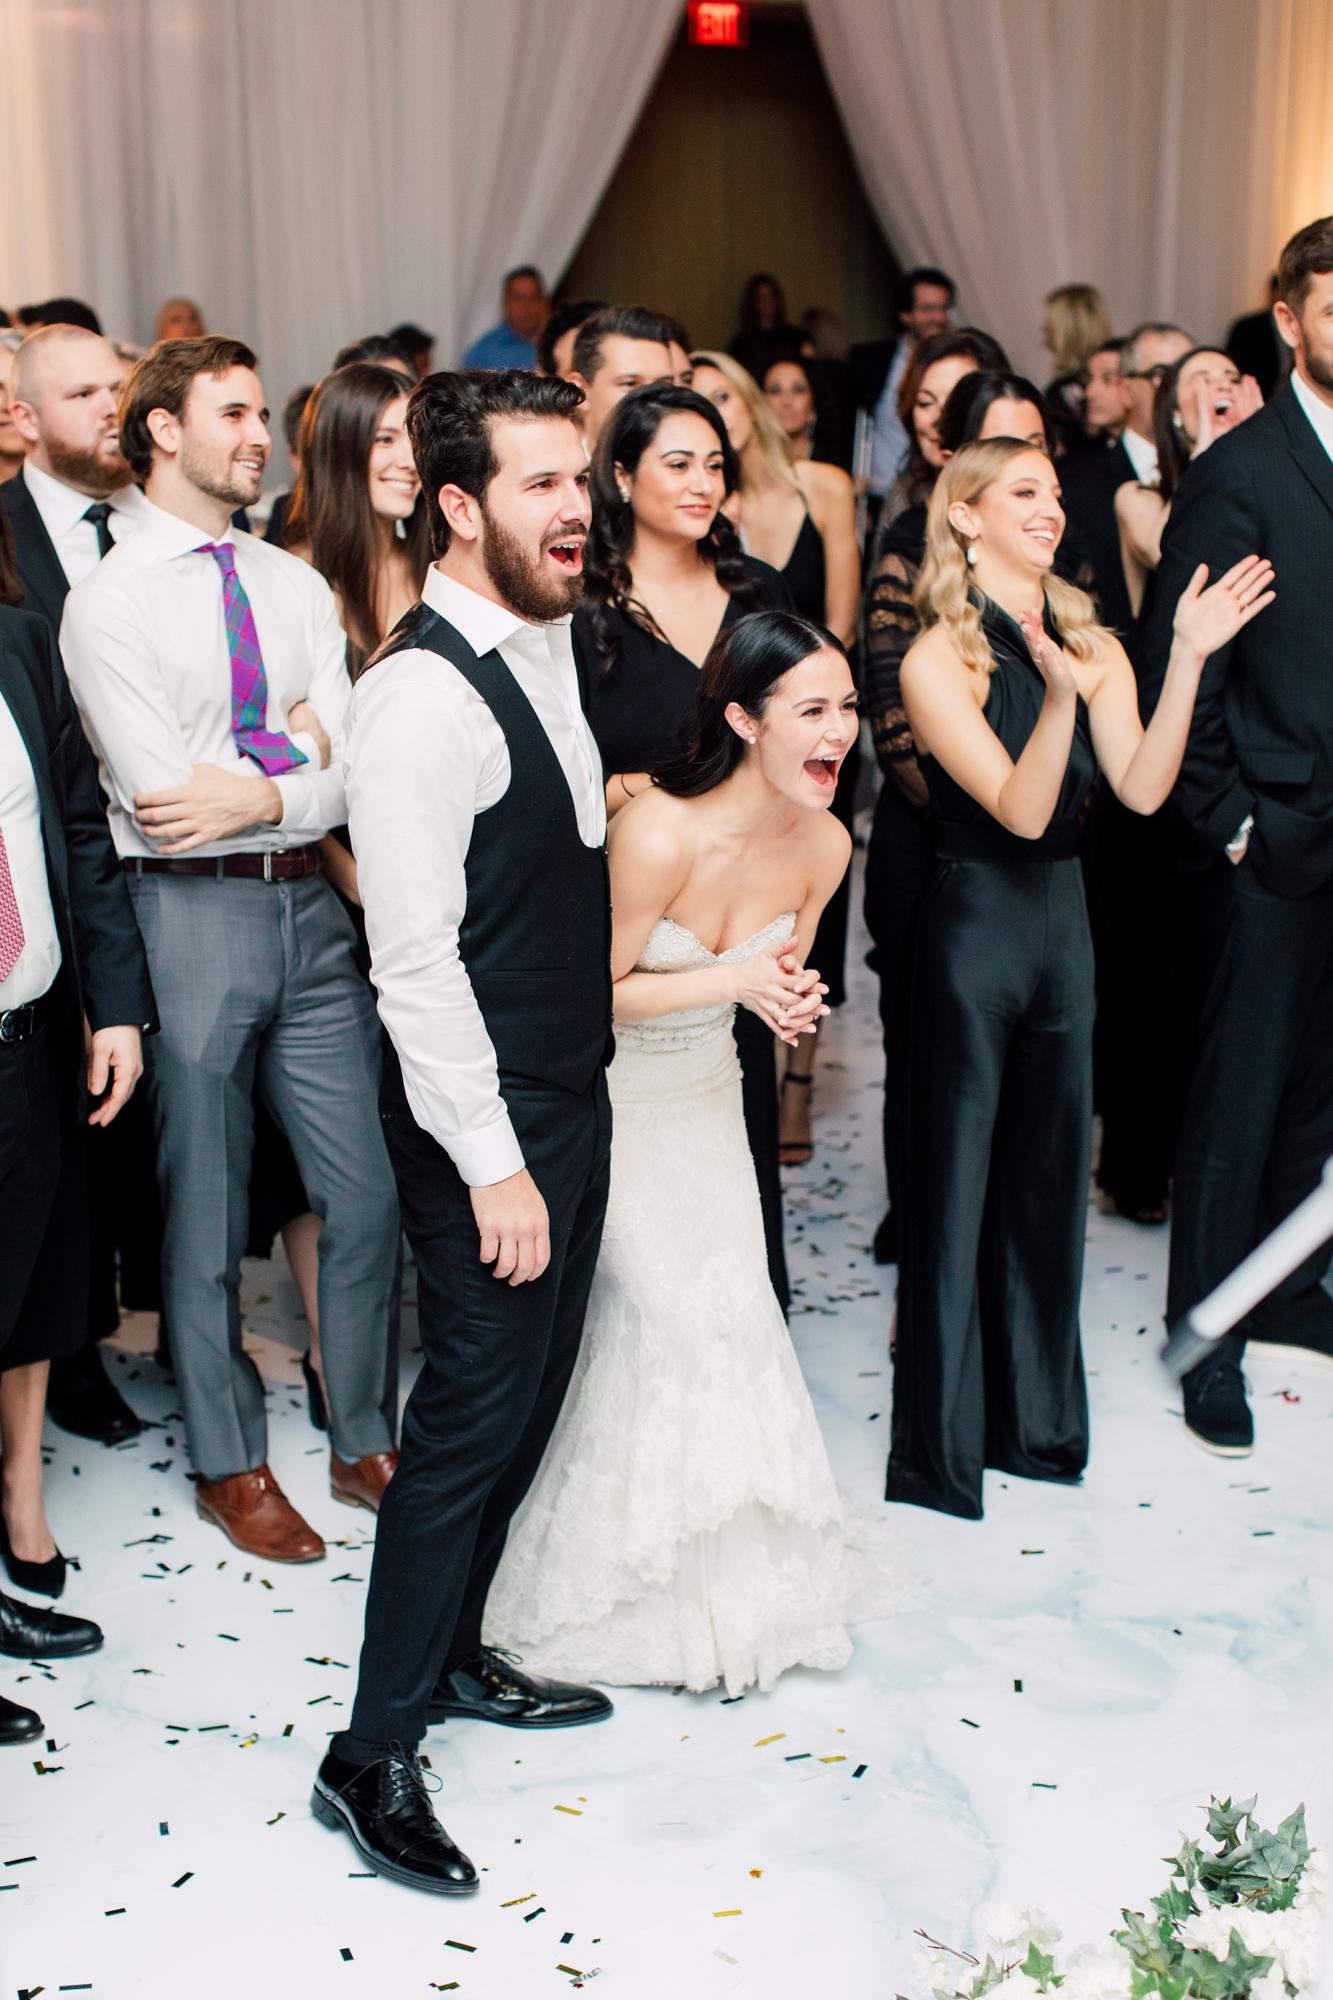 laughing wedding reception